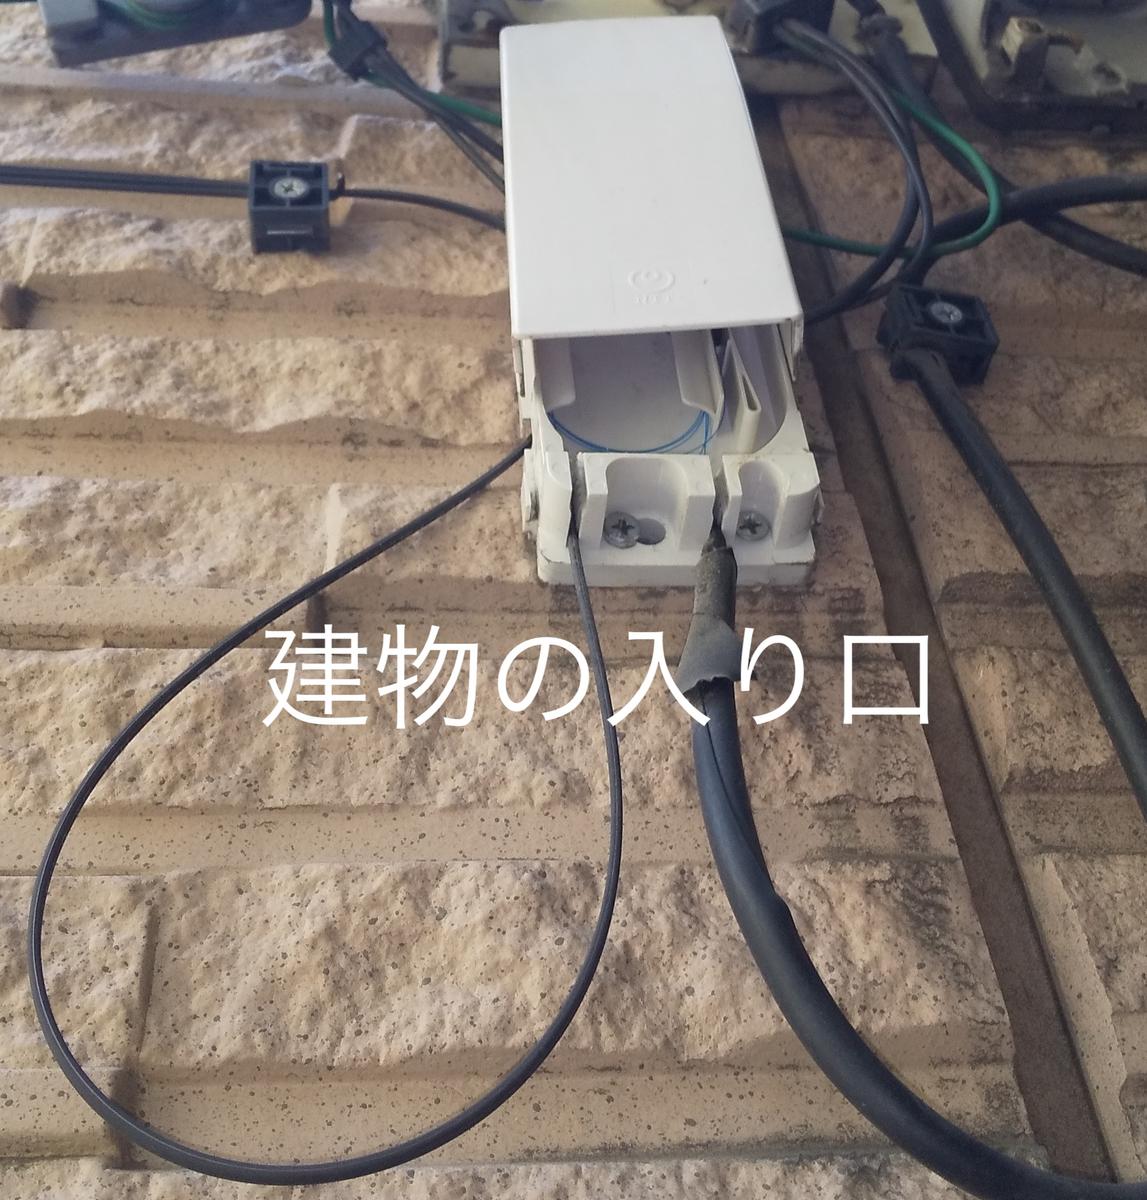 f:id:yasuikj:20200703130812p:plain:w220